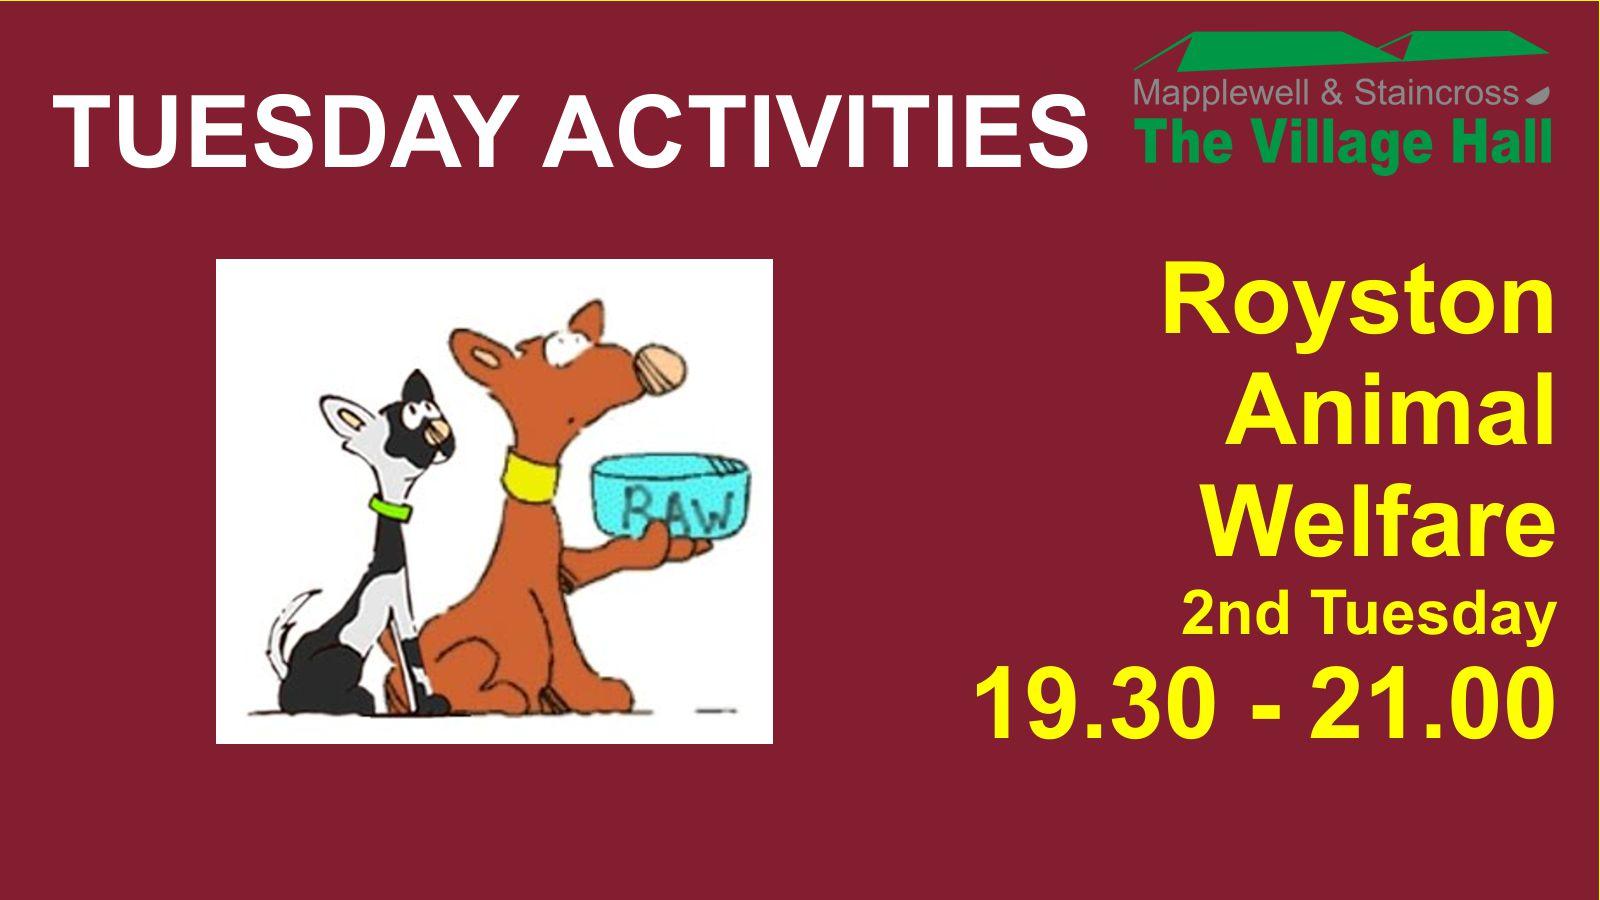 (C) Nick Hibberd - Royston Animal Welfare